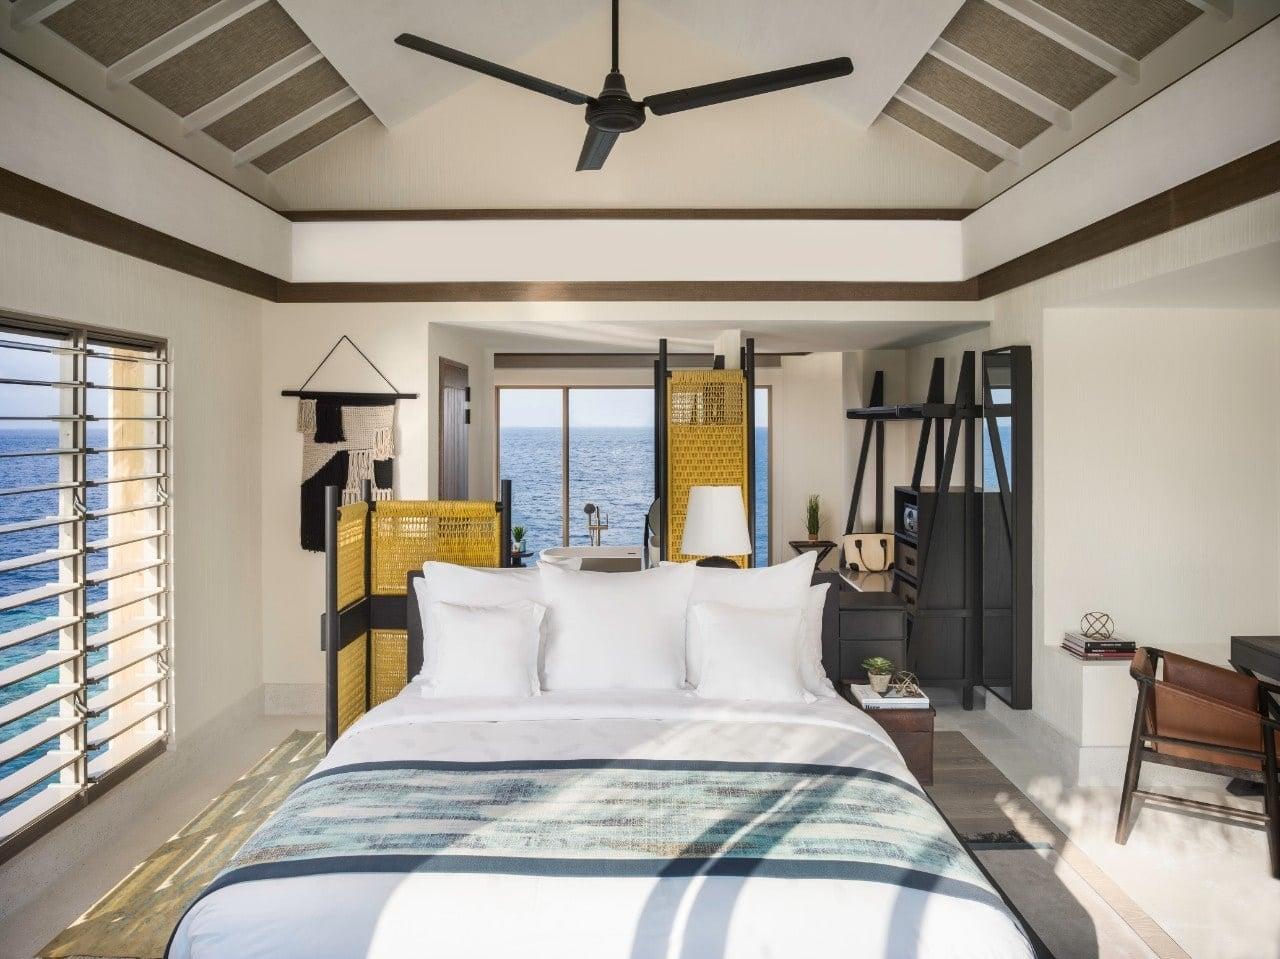 Мальдивы, отель Intercontinental Maldives Maamunagau, номер One Bedroom Lagoon Pool Villa